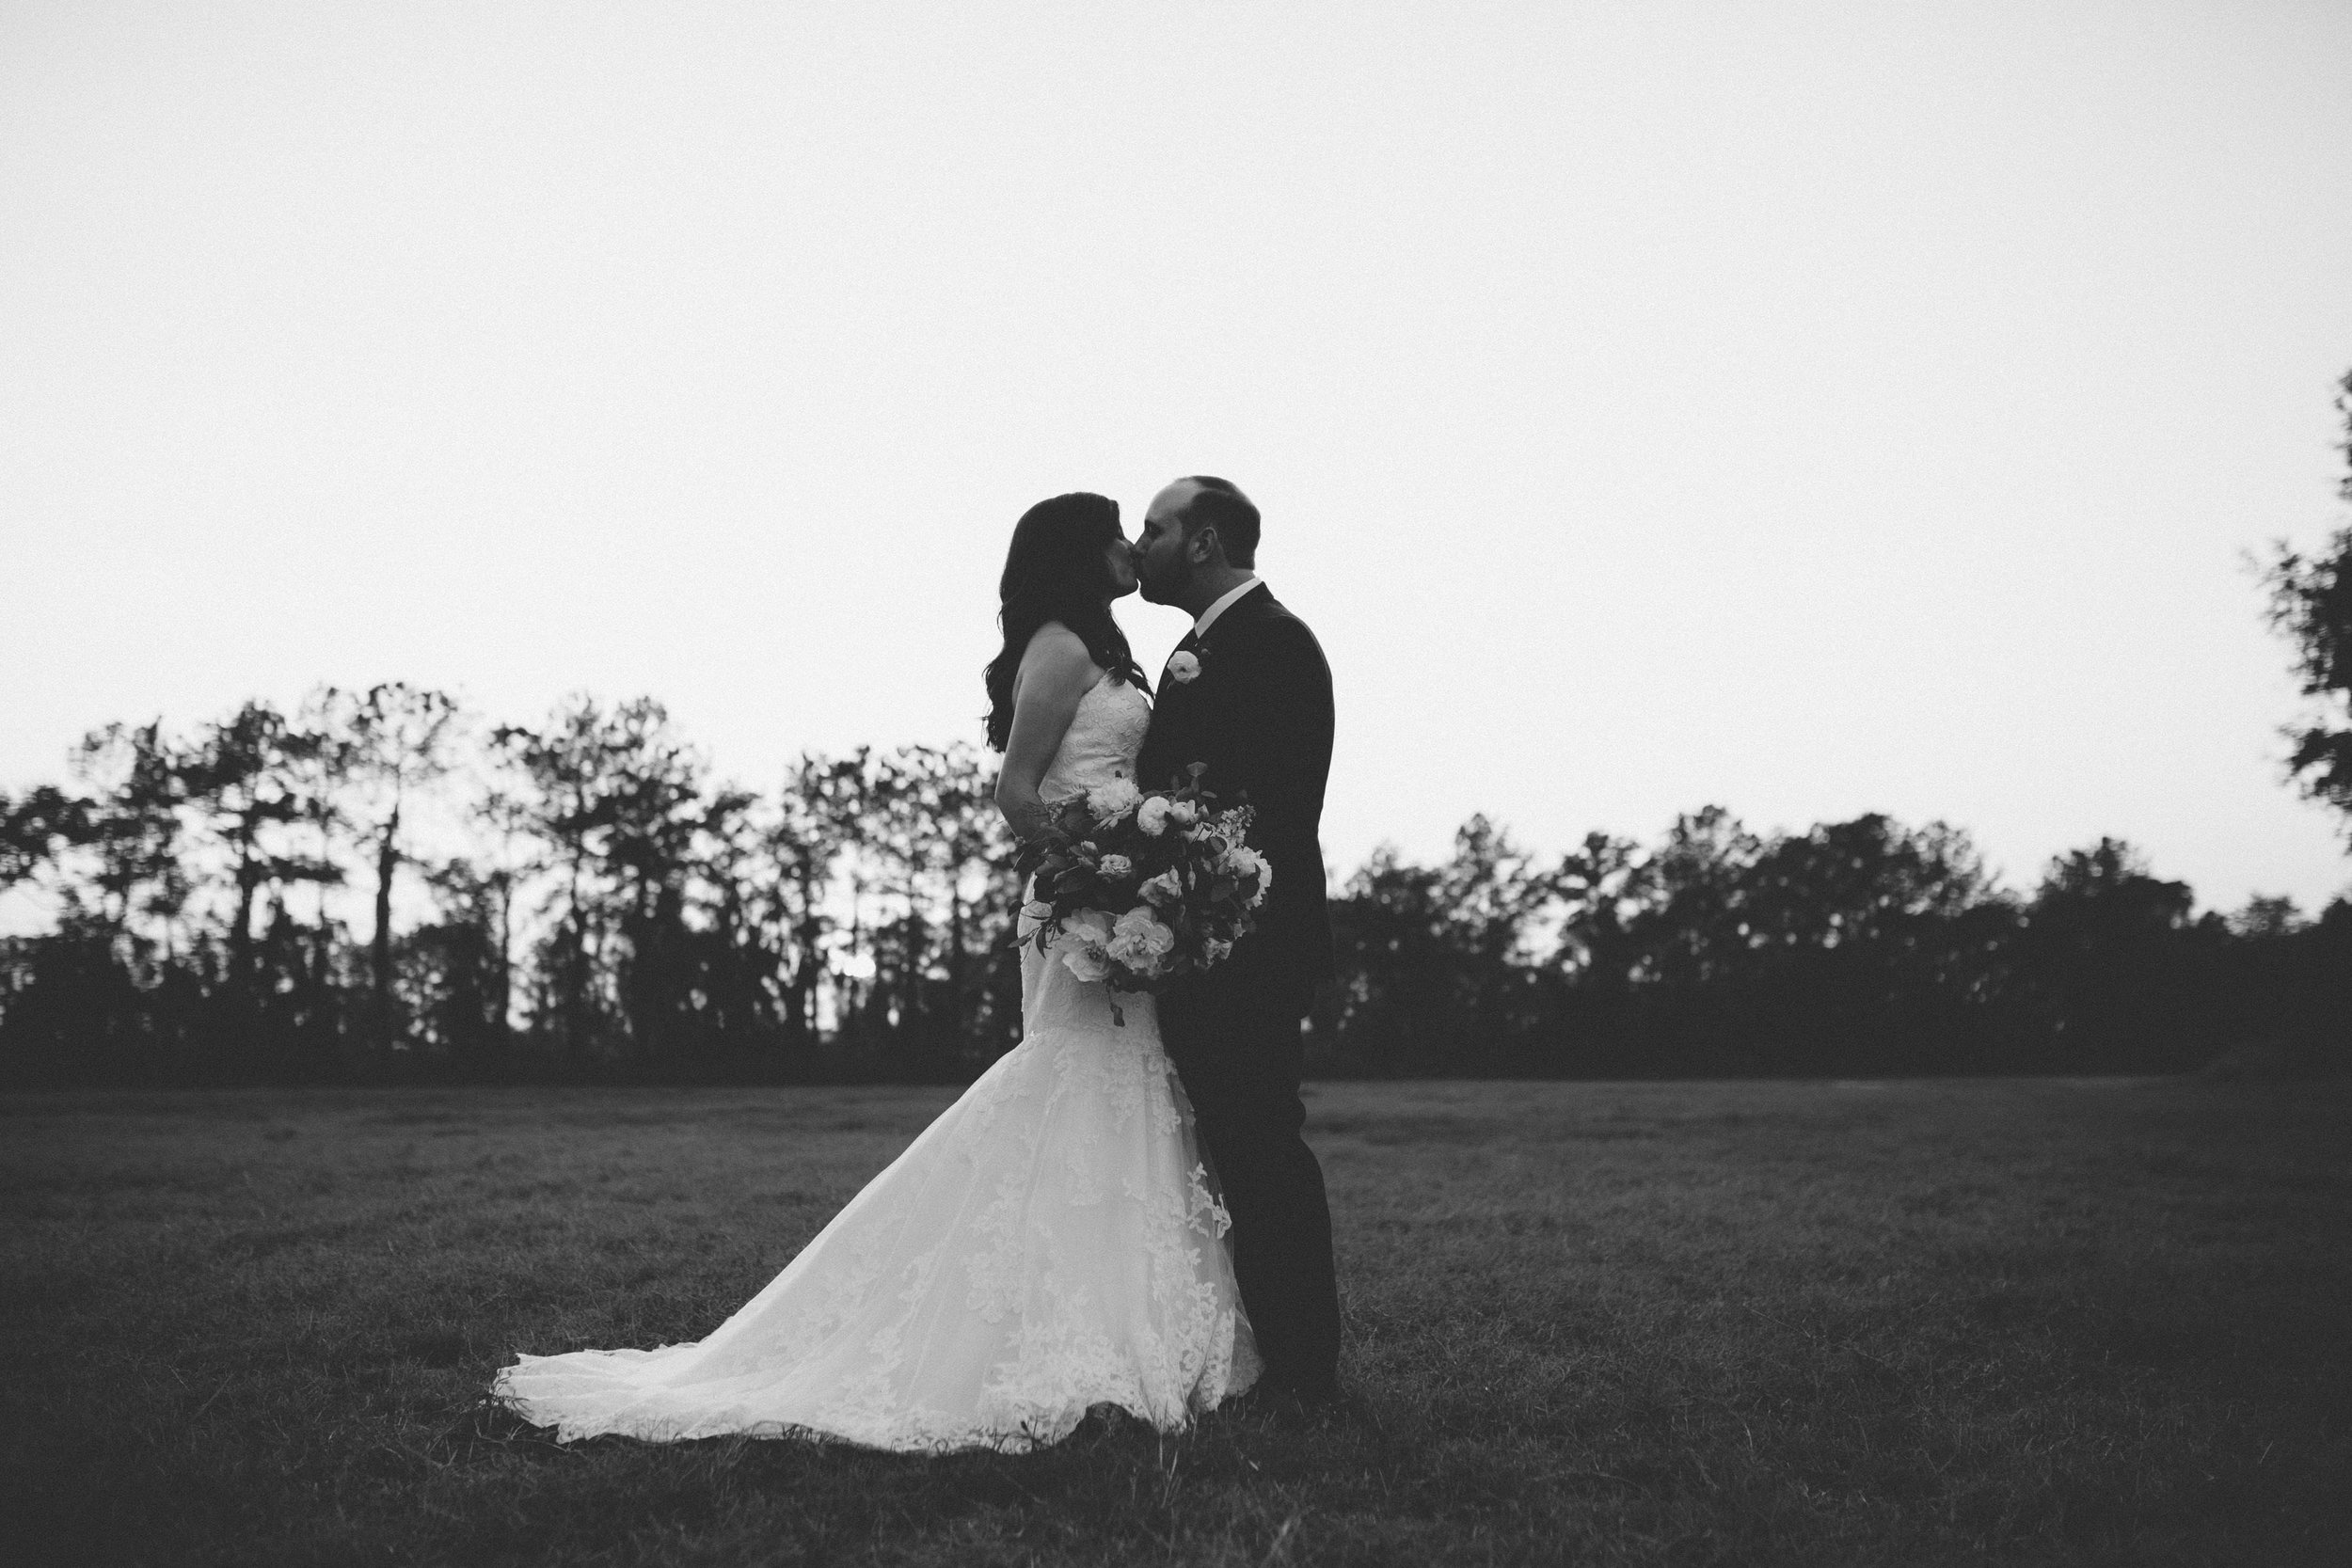 Bride Groom Portraits   Florida Rustic Barn Weddings   Plant City, Florida Wedding Photography   Benjamin Hewitt Photographer